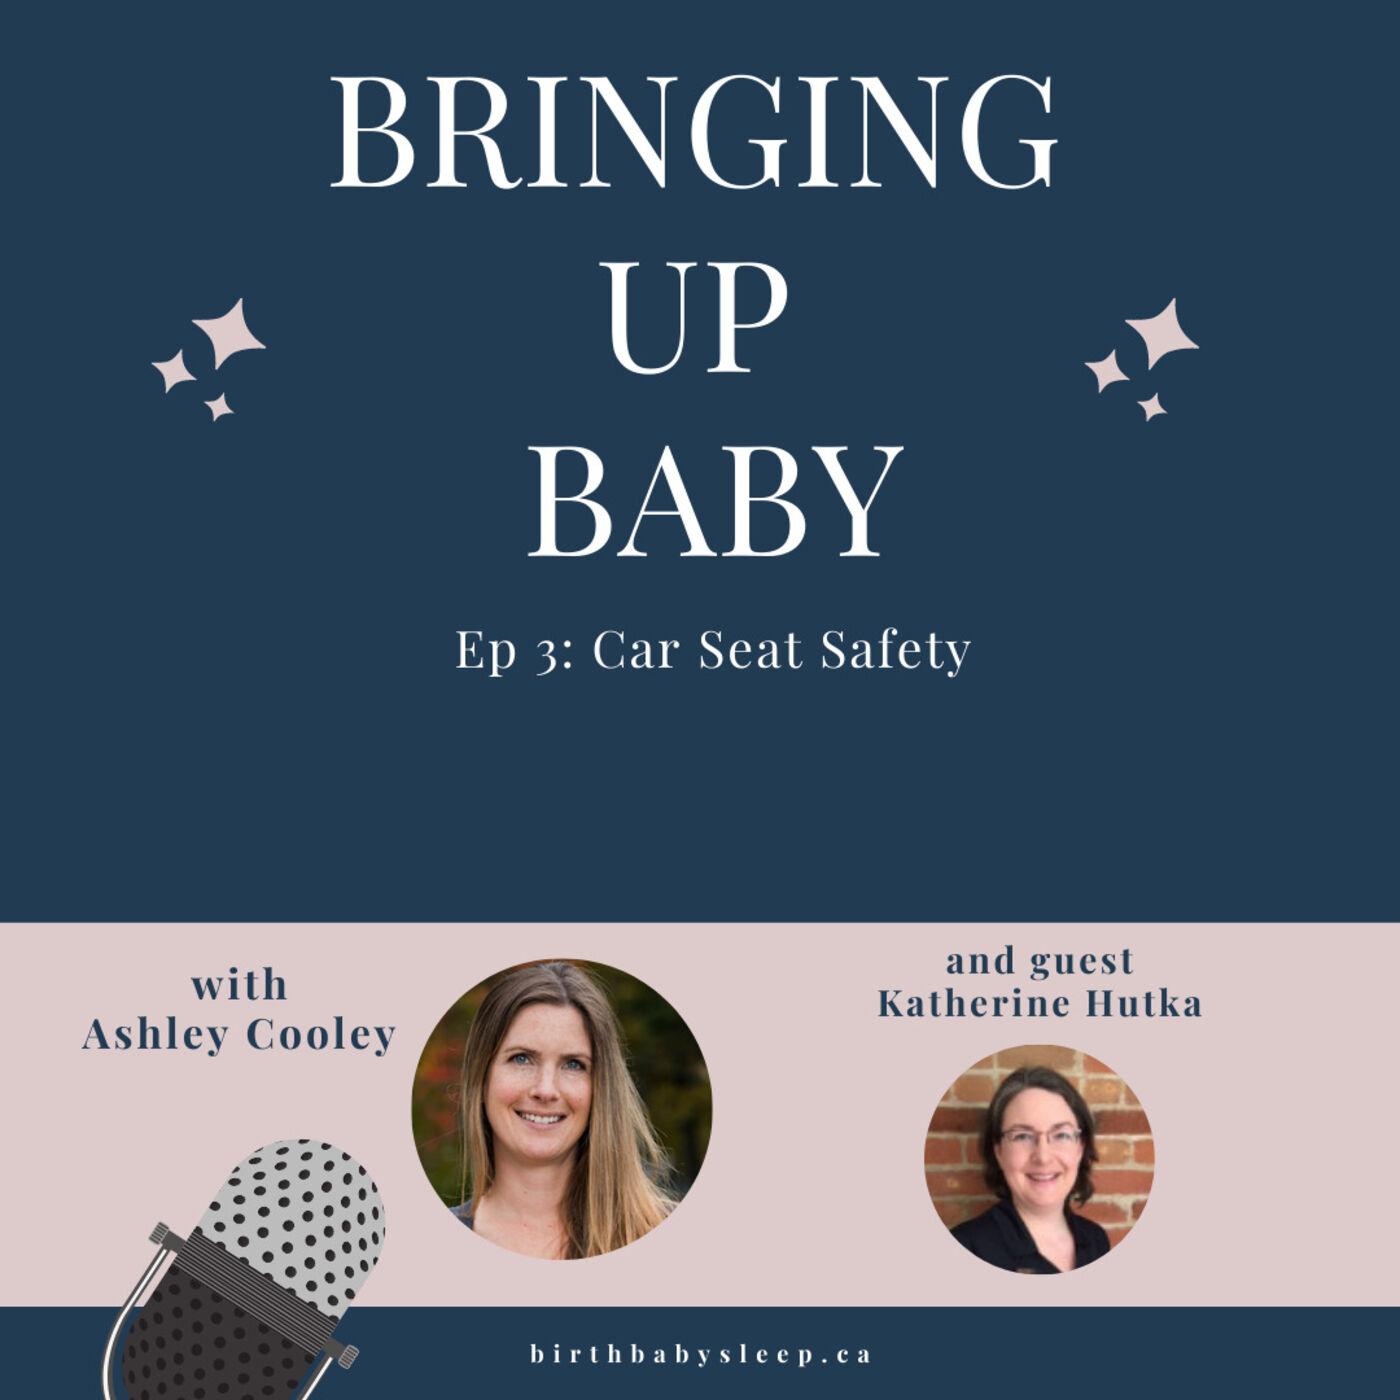 Car Seat Safety with Katherine Hutka